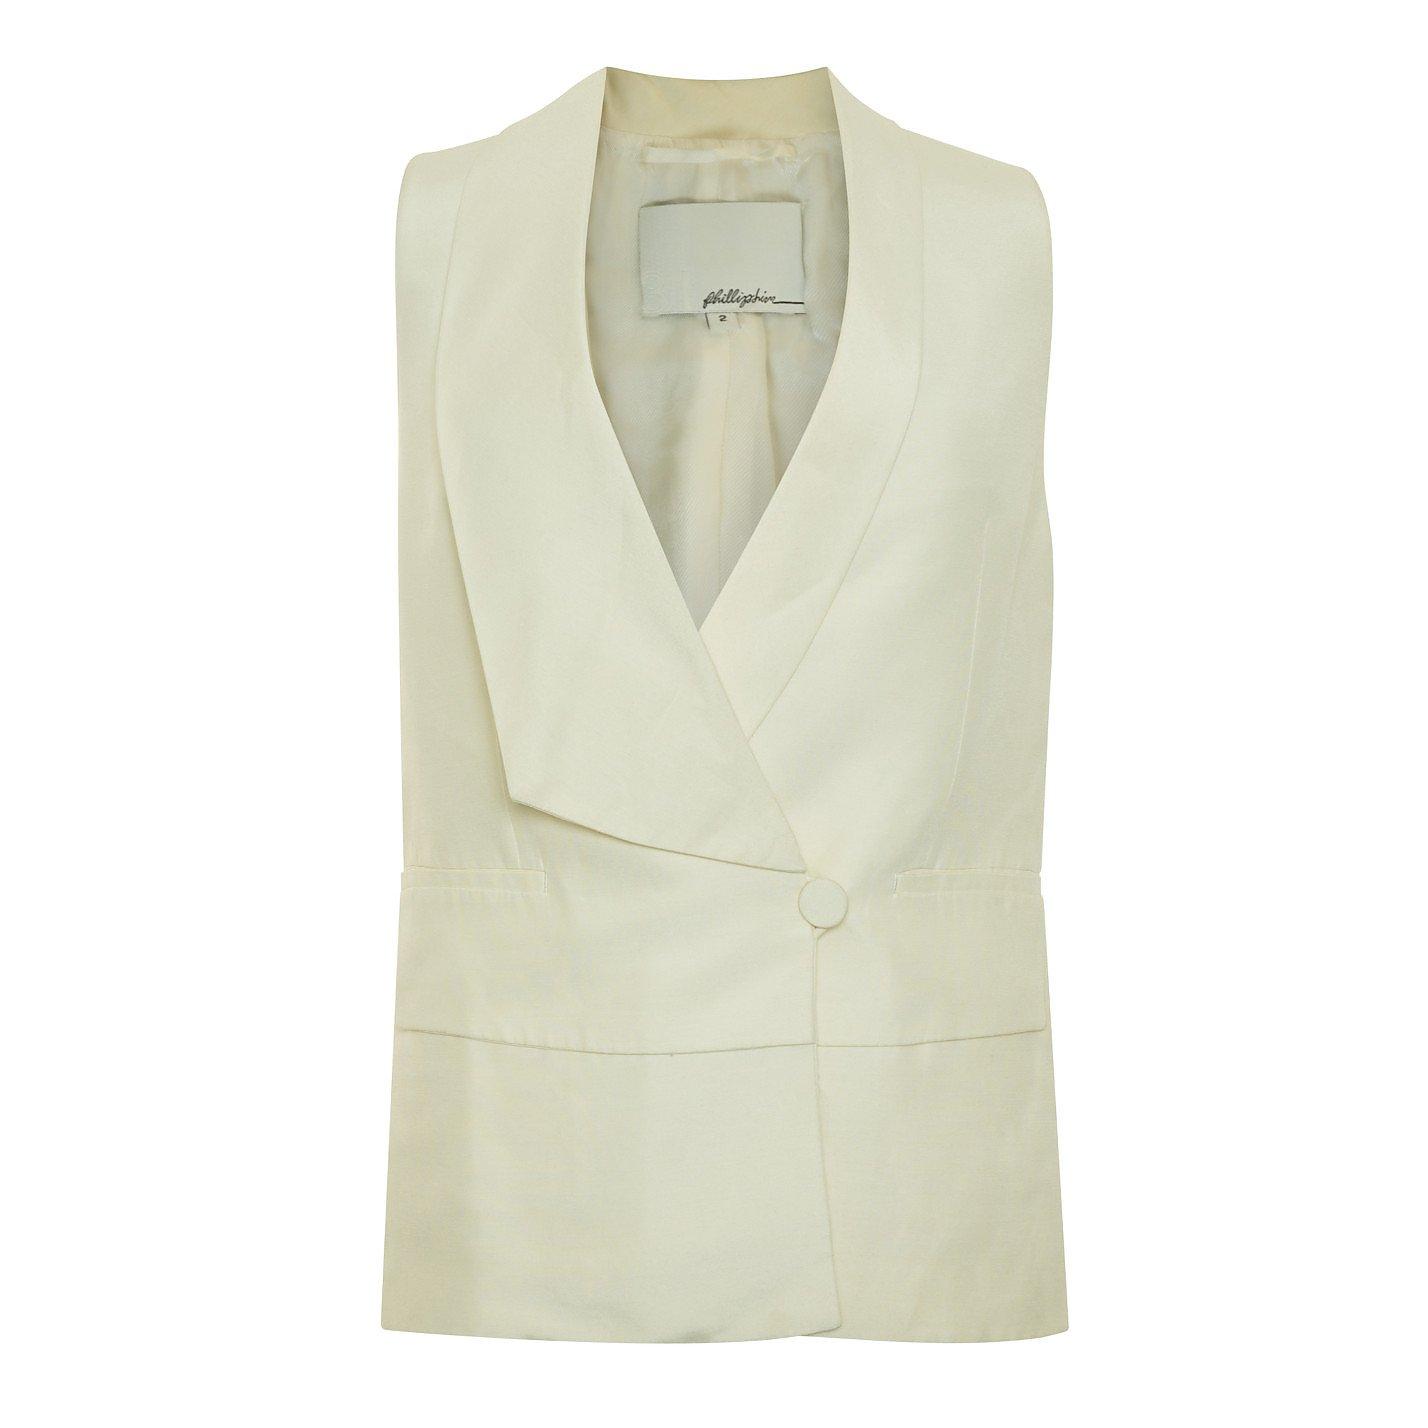 3.1 Phillip Lim Blazer-Style Vest